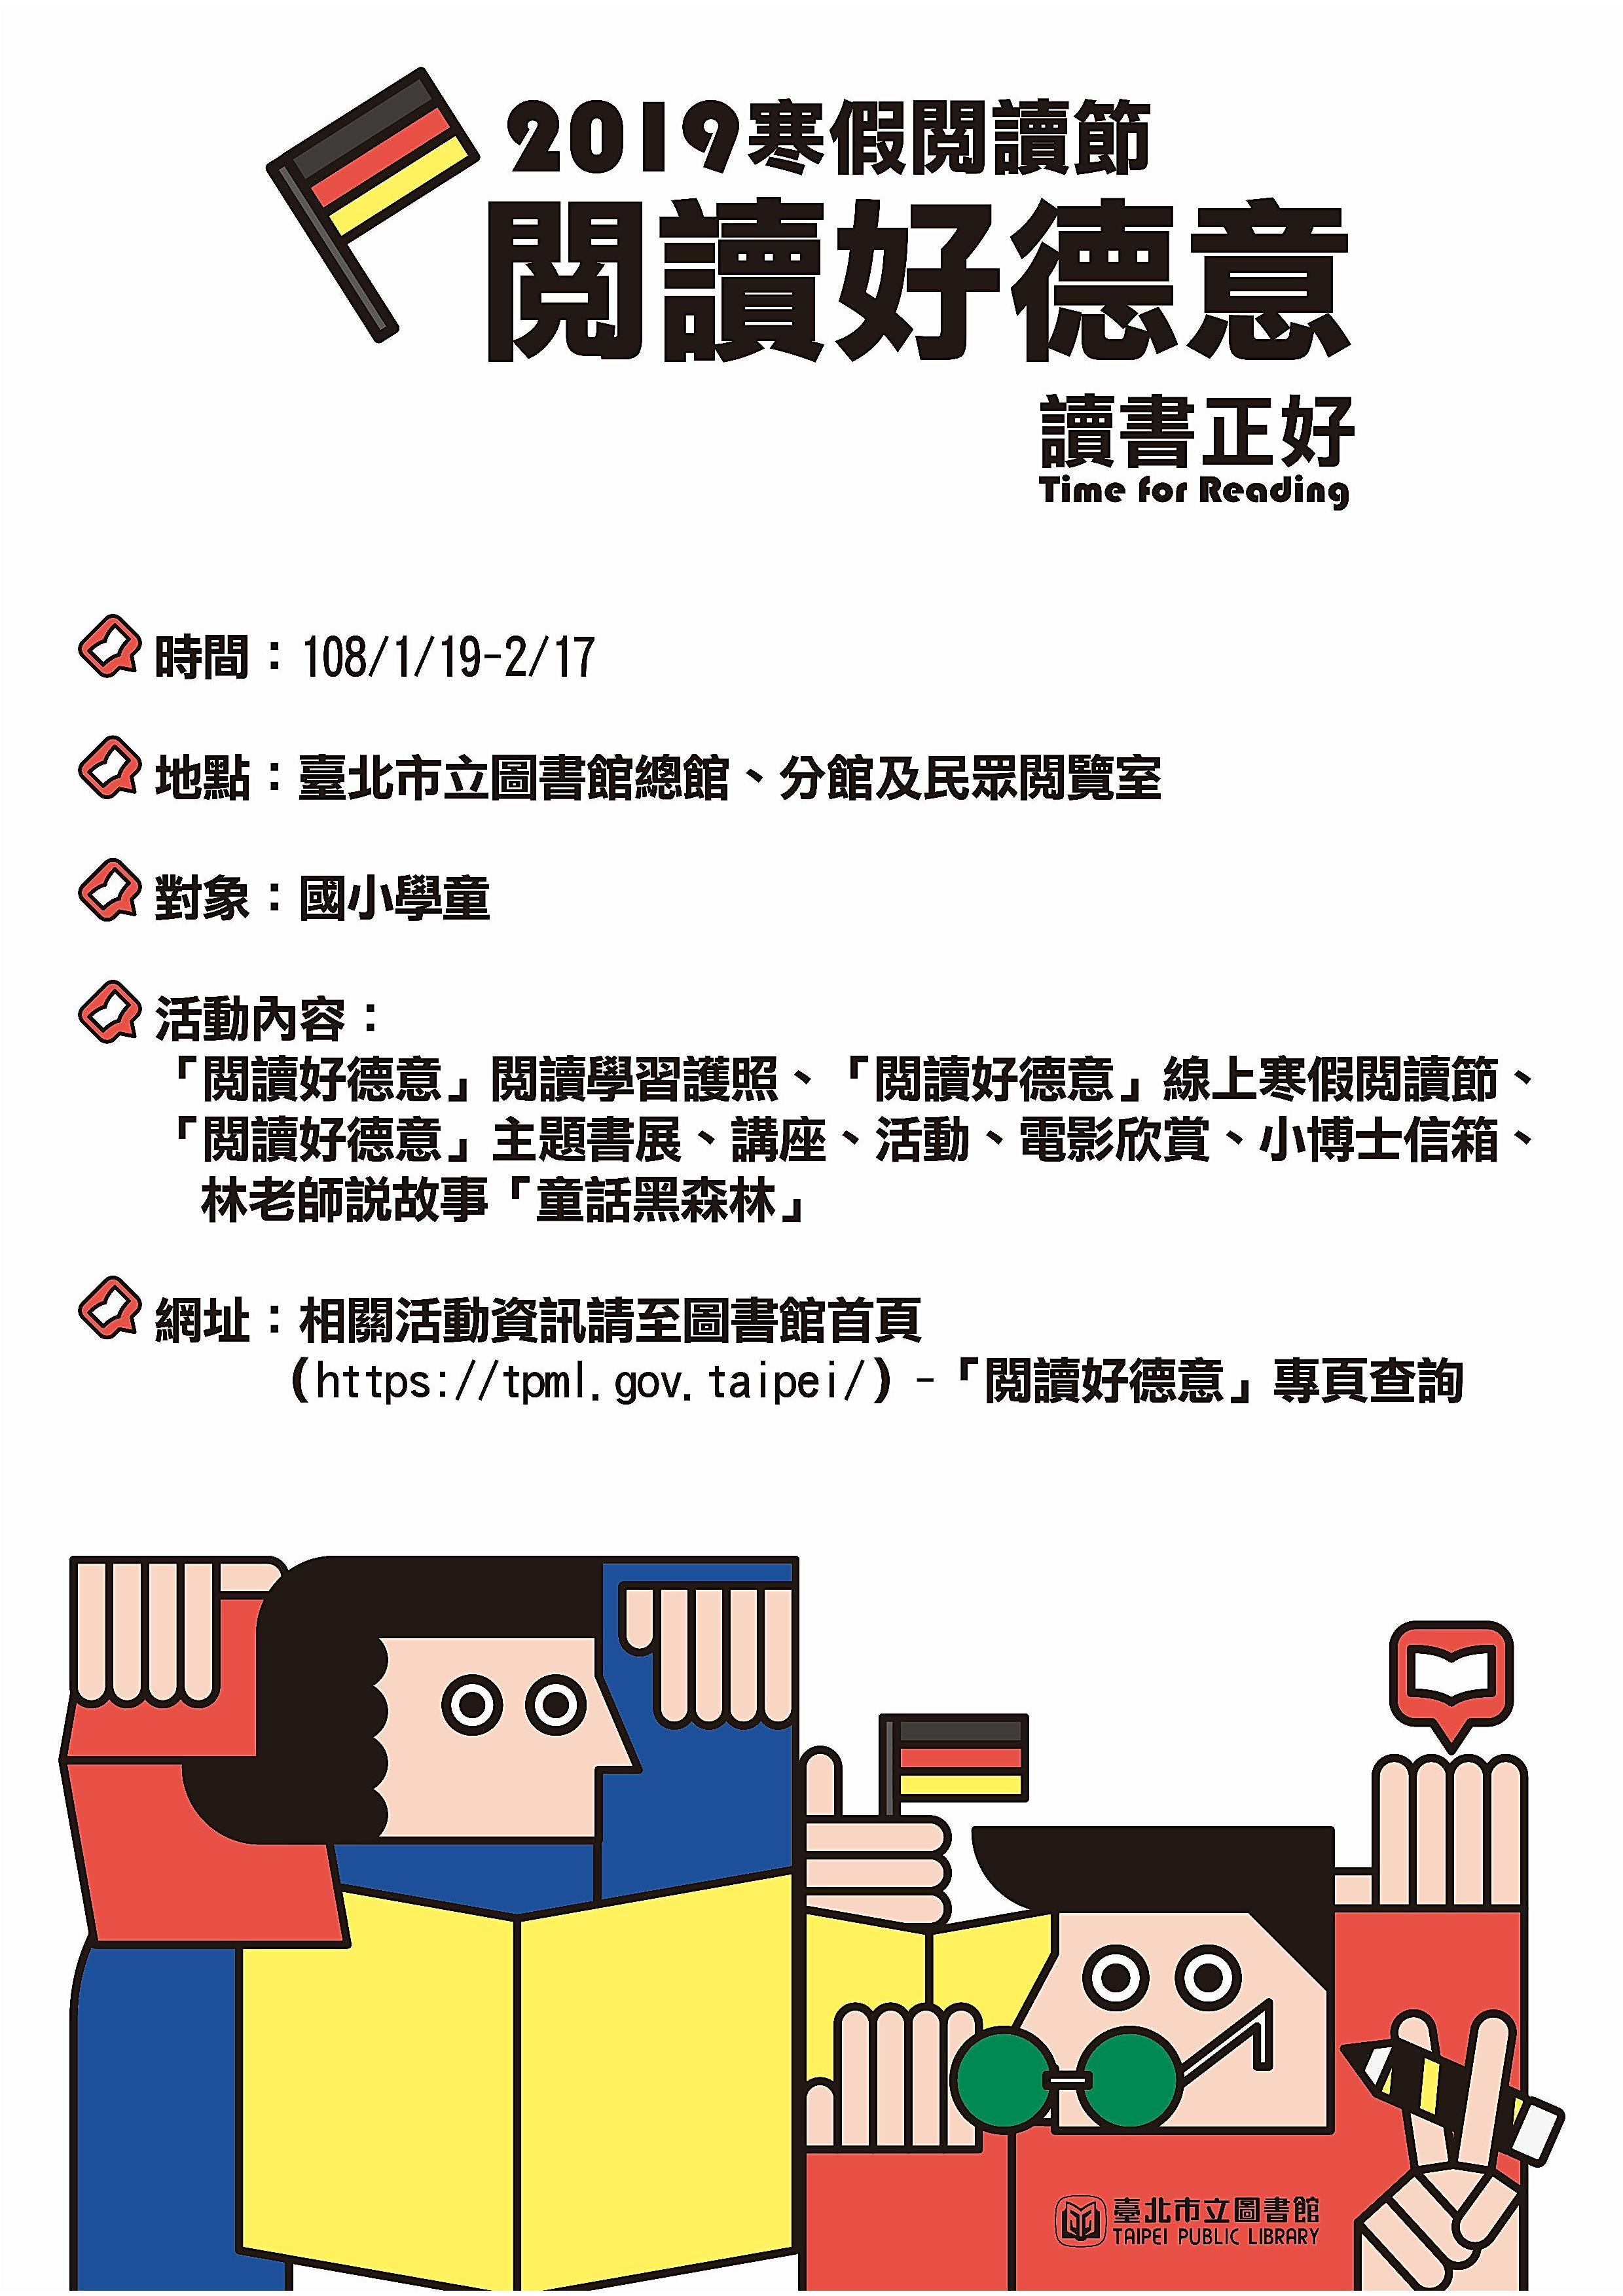 https://tpml.gov.taipei/News_Content.aspx?n=057F7CE33AEF867C&sms=9D72E82EC16F3E64&s=D6B0274CA7914D8A